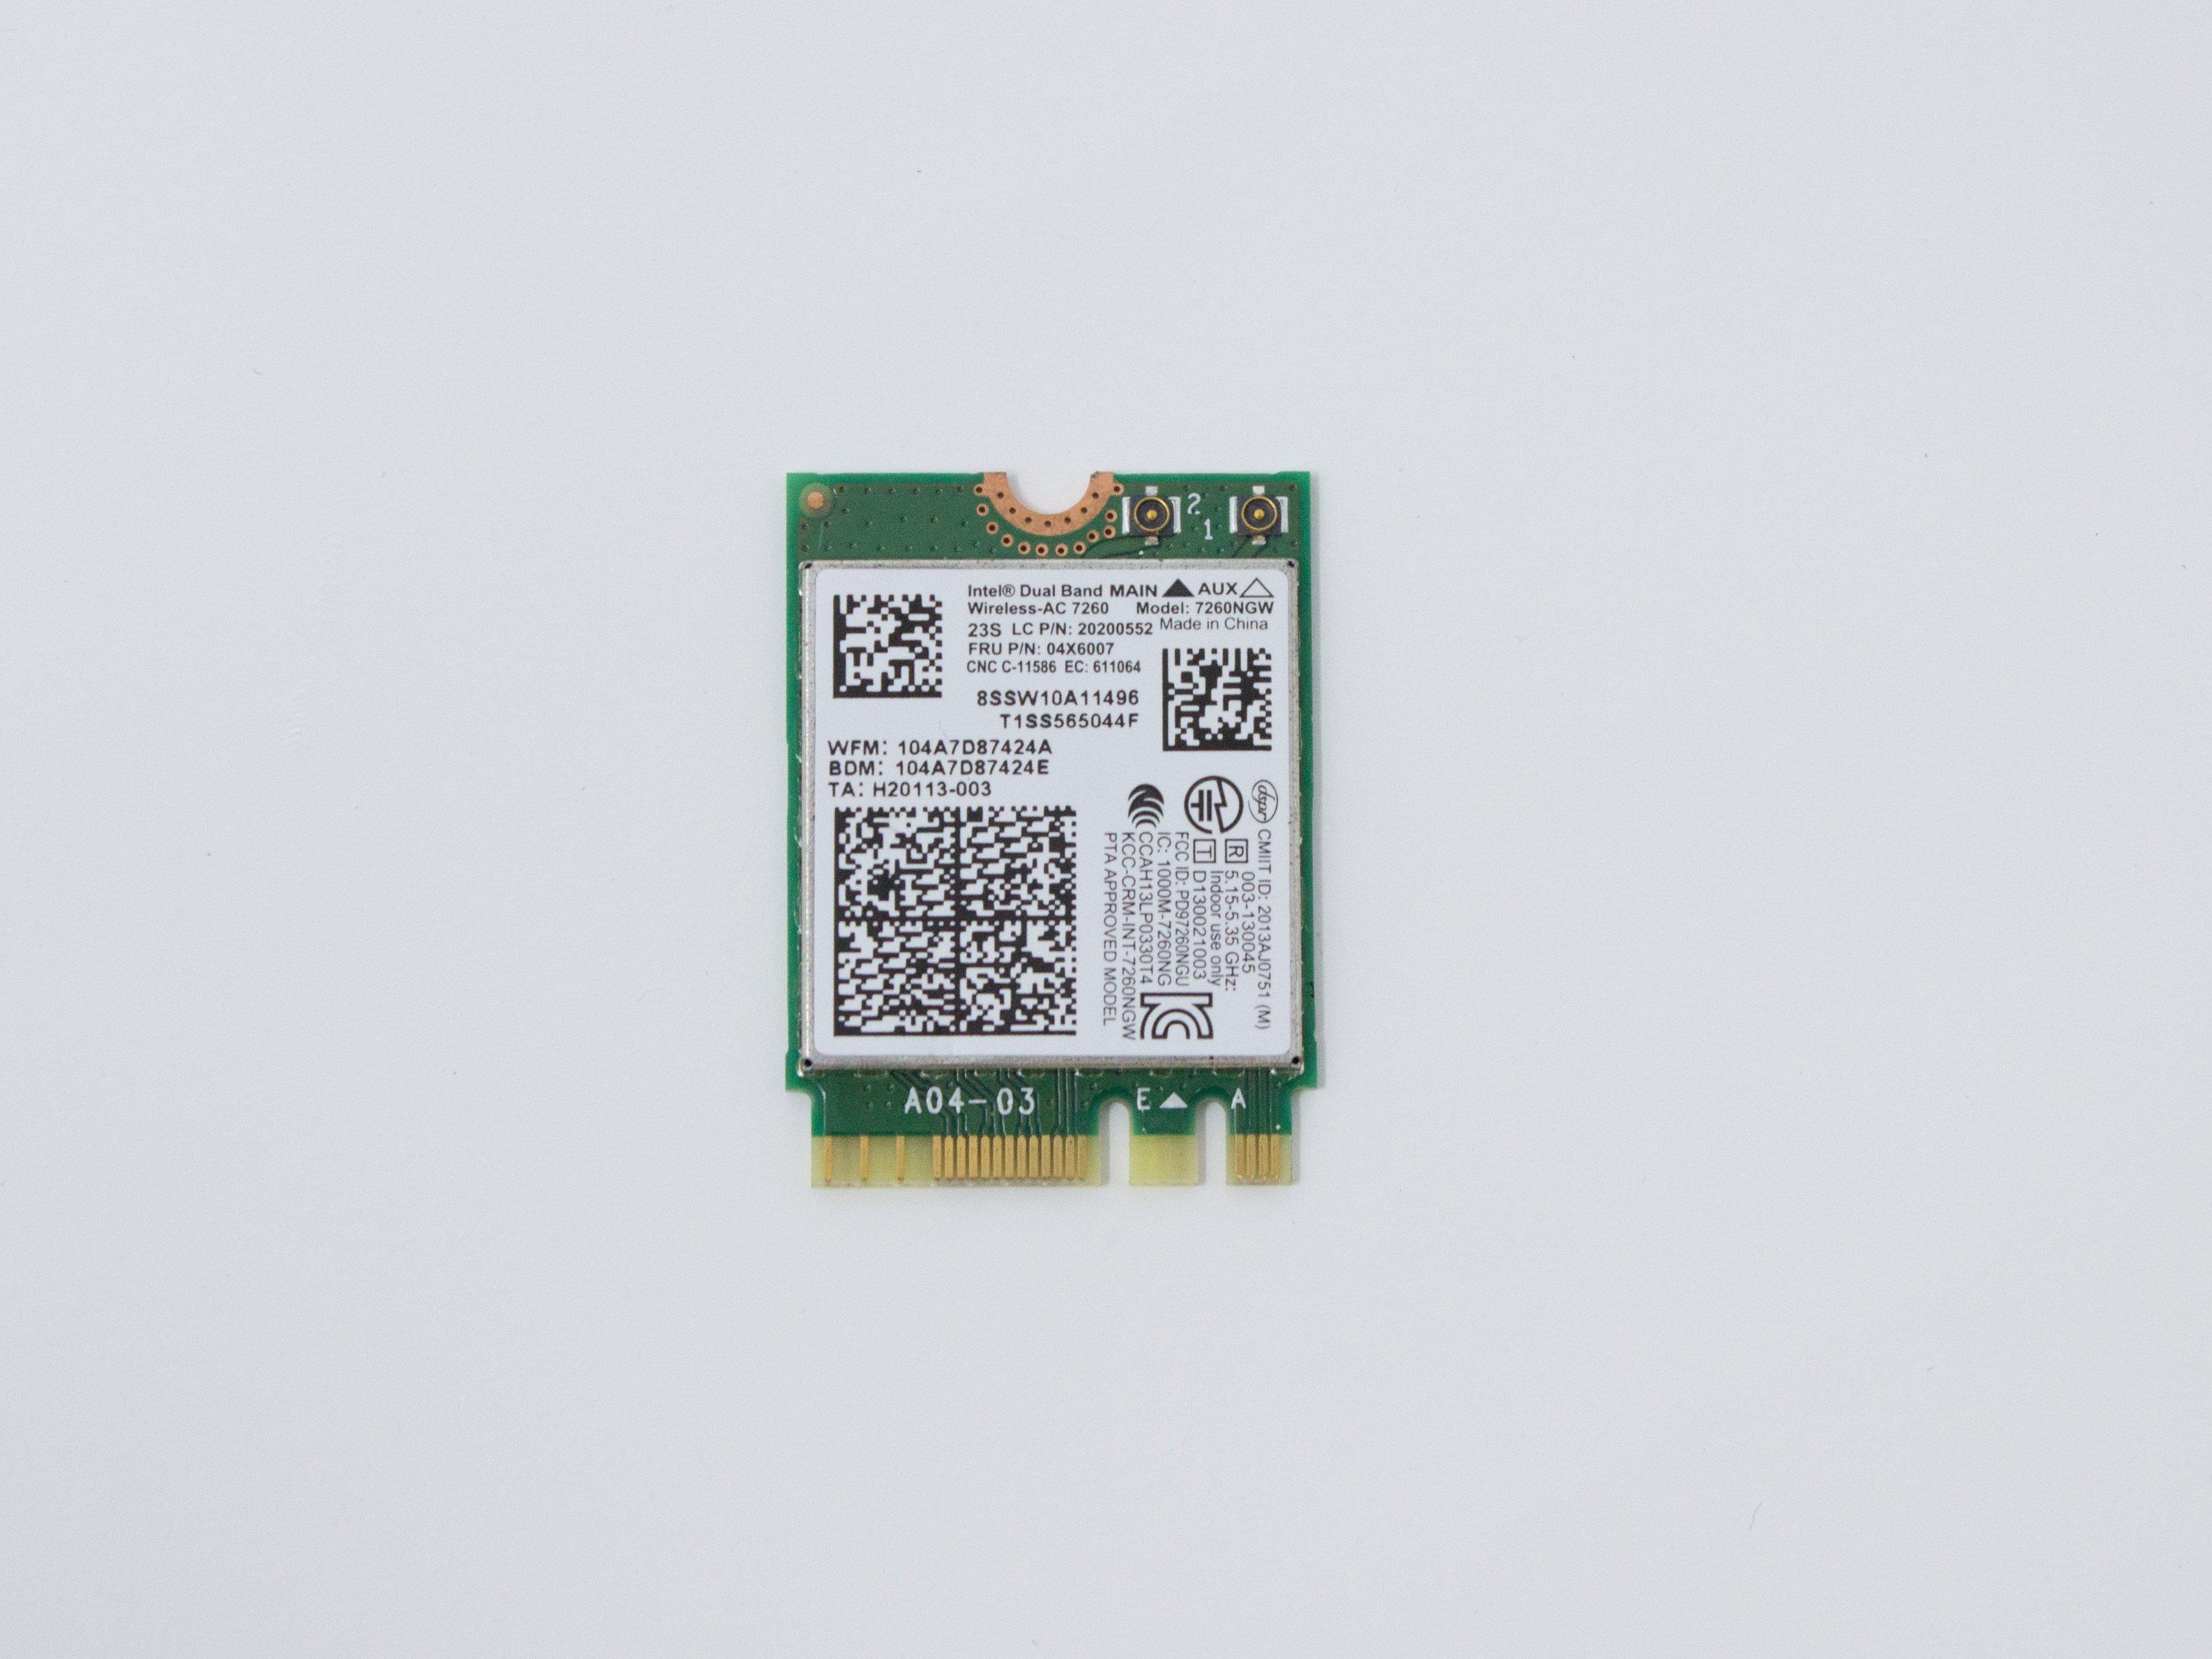 Lenovo N20p Chromebook WLAN & Bluetooth Replacement